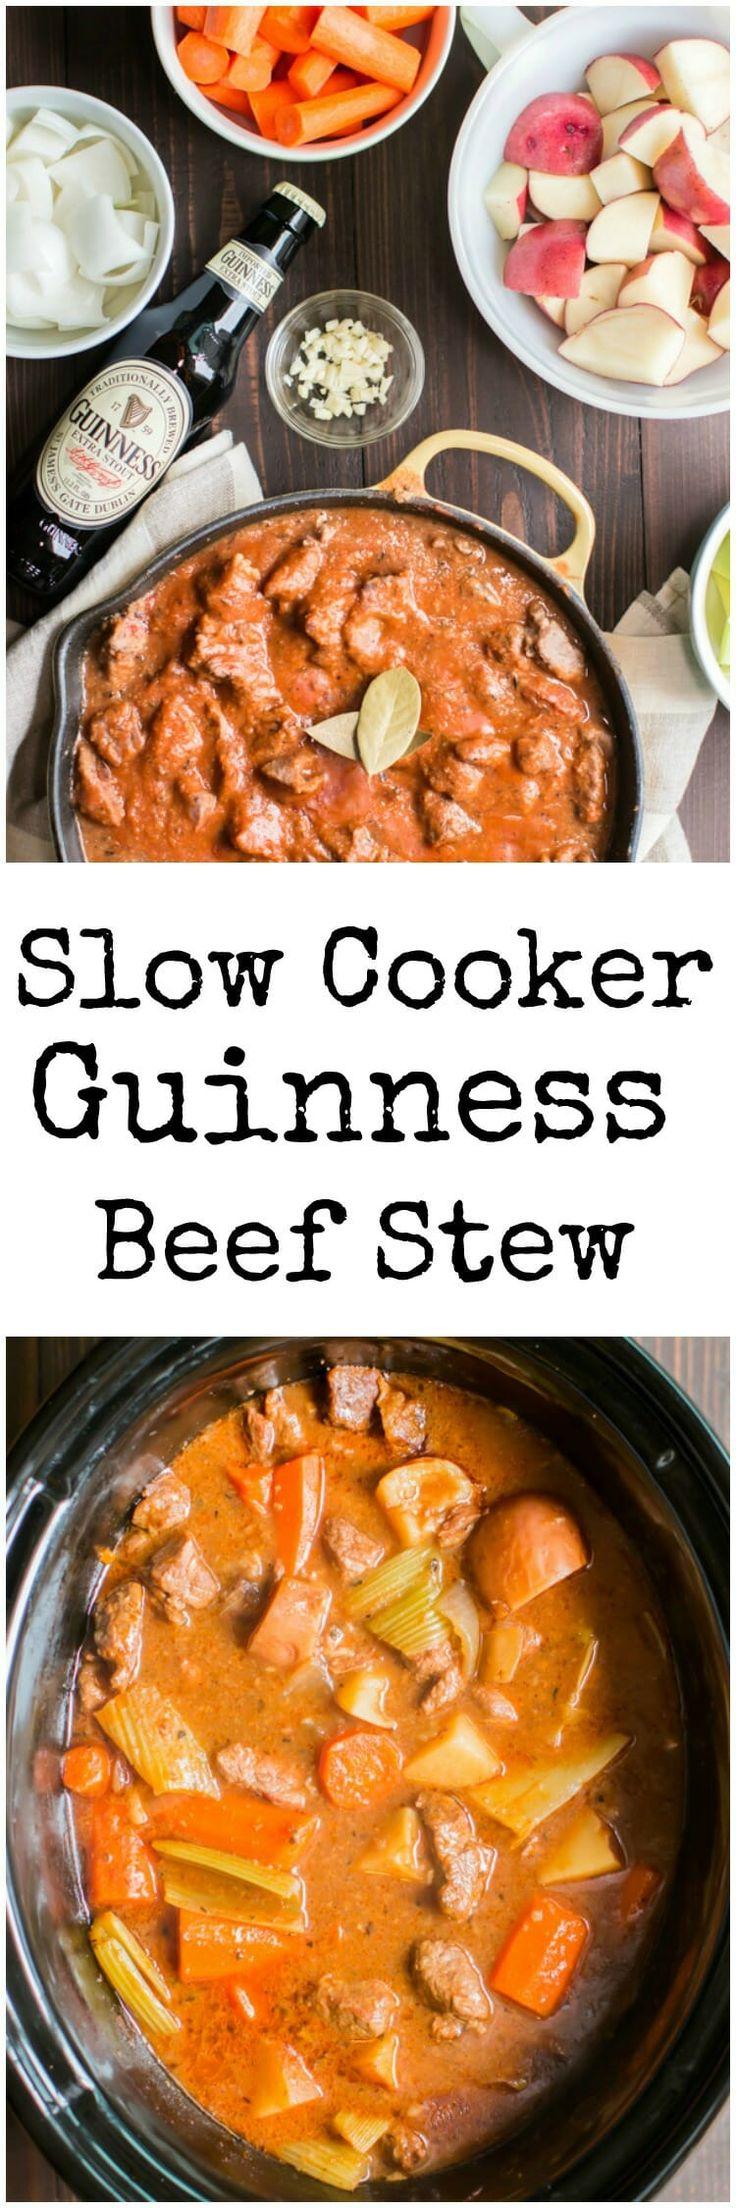 Slow Cooker Guinness Beef Stew #crockpot #slowcooker #guinness